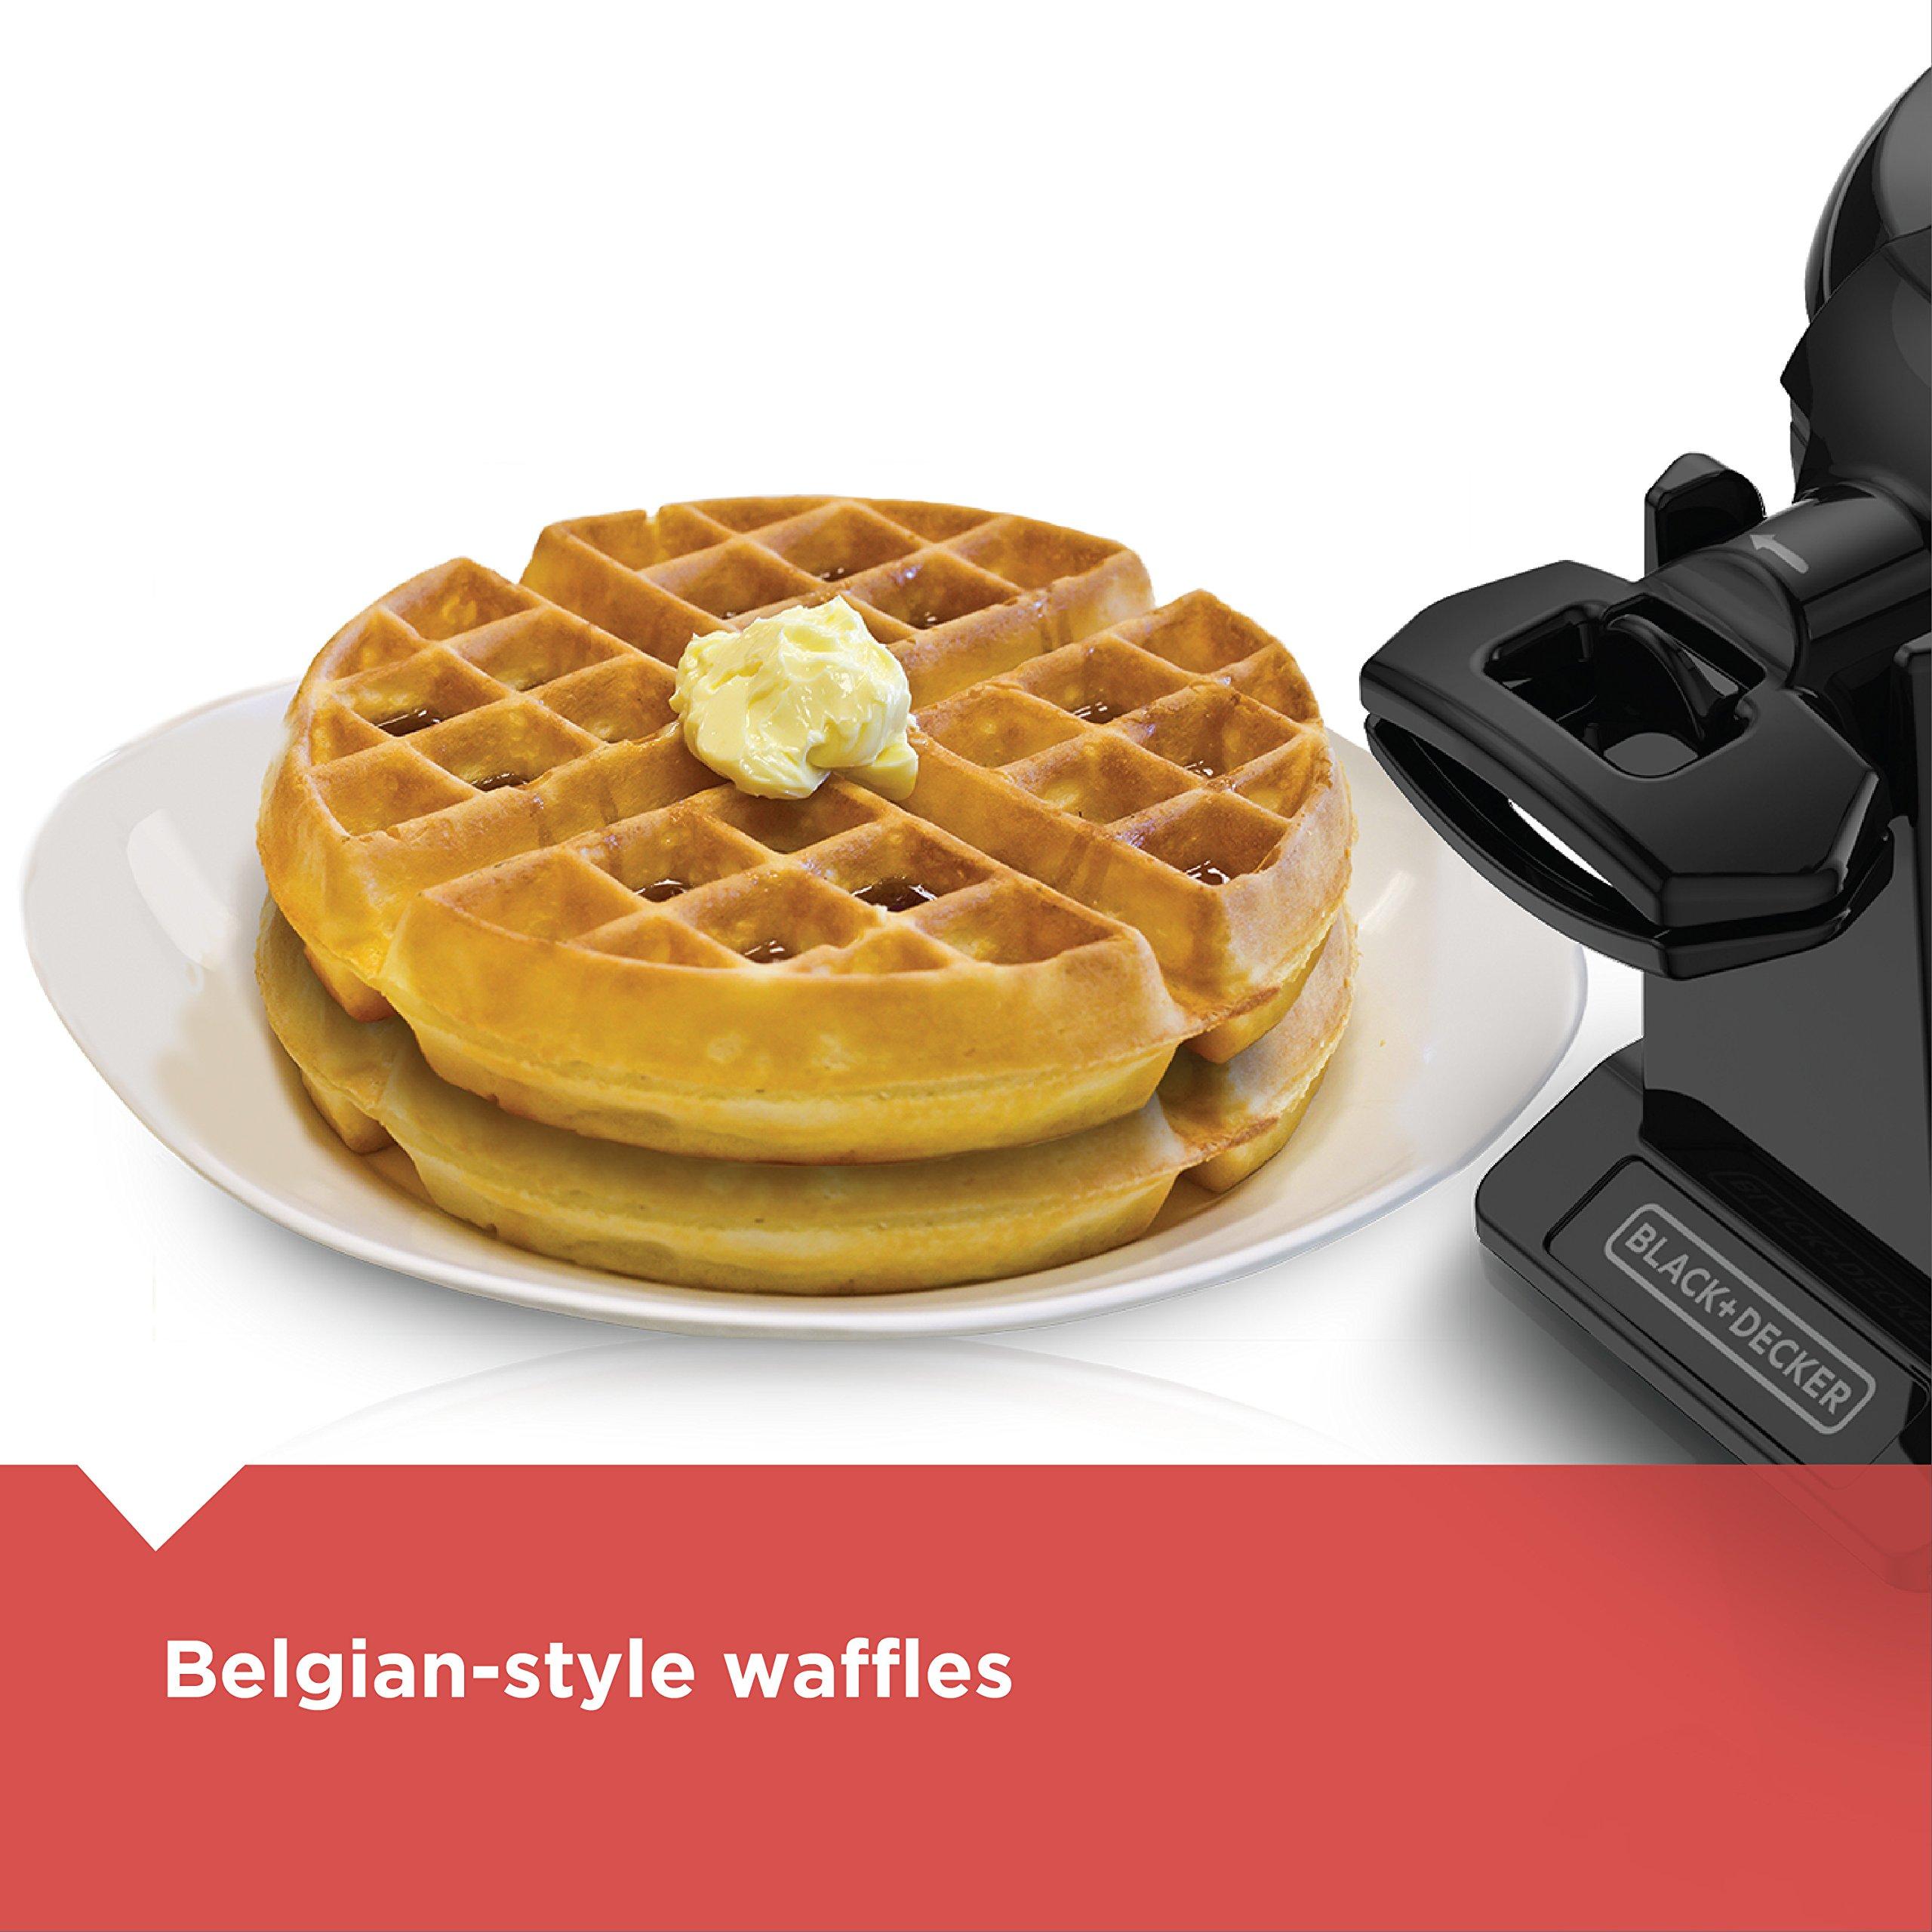 BLACK+DECKER Rotating Waffle Maker, Black, WMD200B by BLACK+DECKER (Image #6)